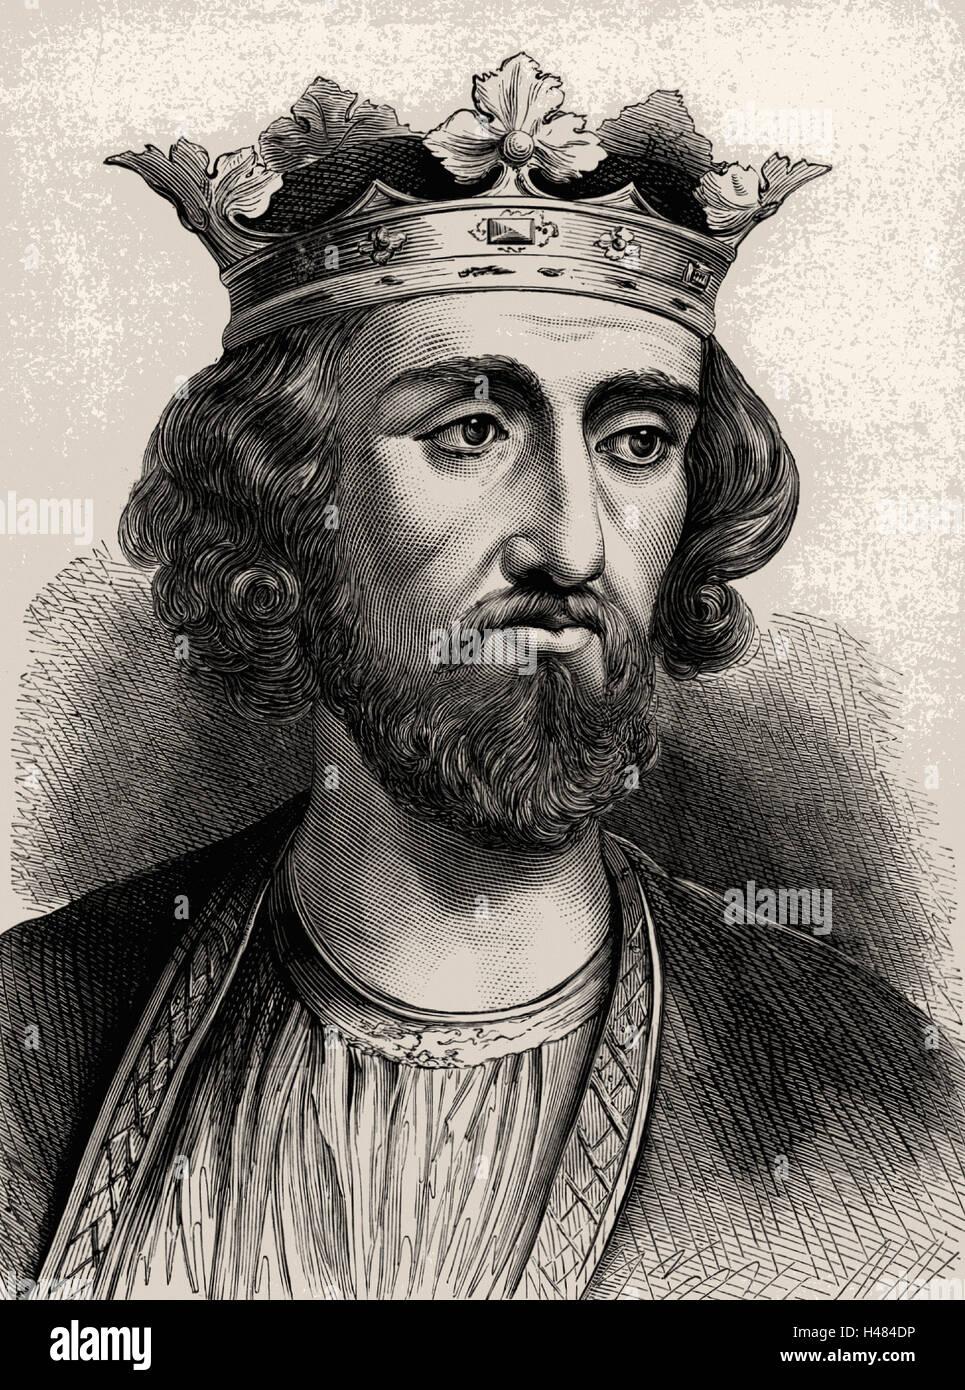 Edward I (1239-1307), king of England from 1272. Known as Edward Longshanks